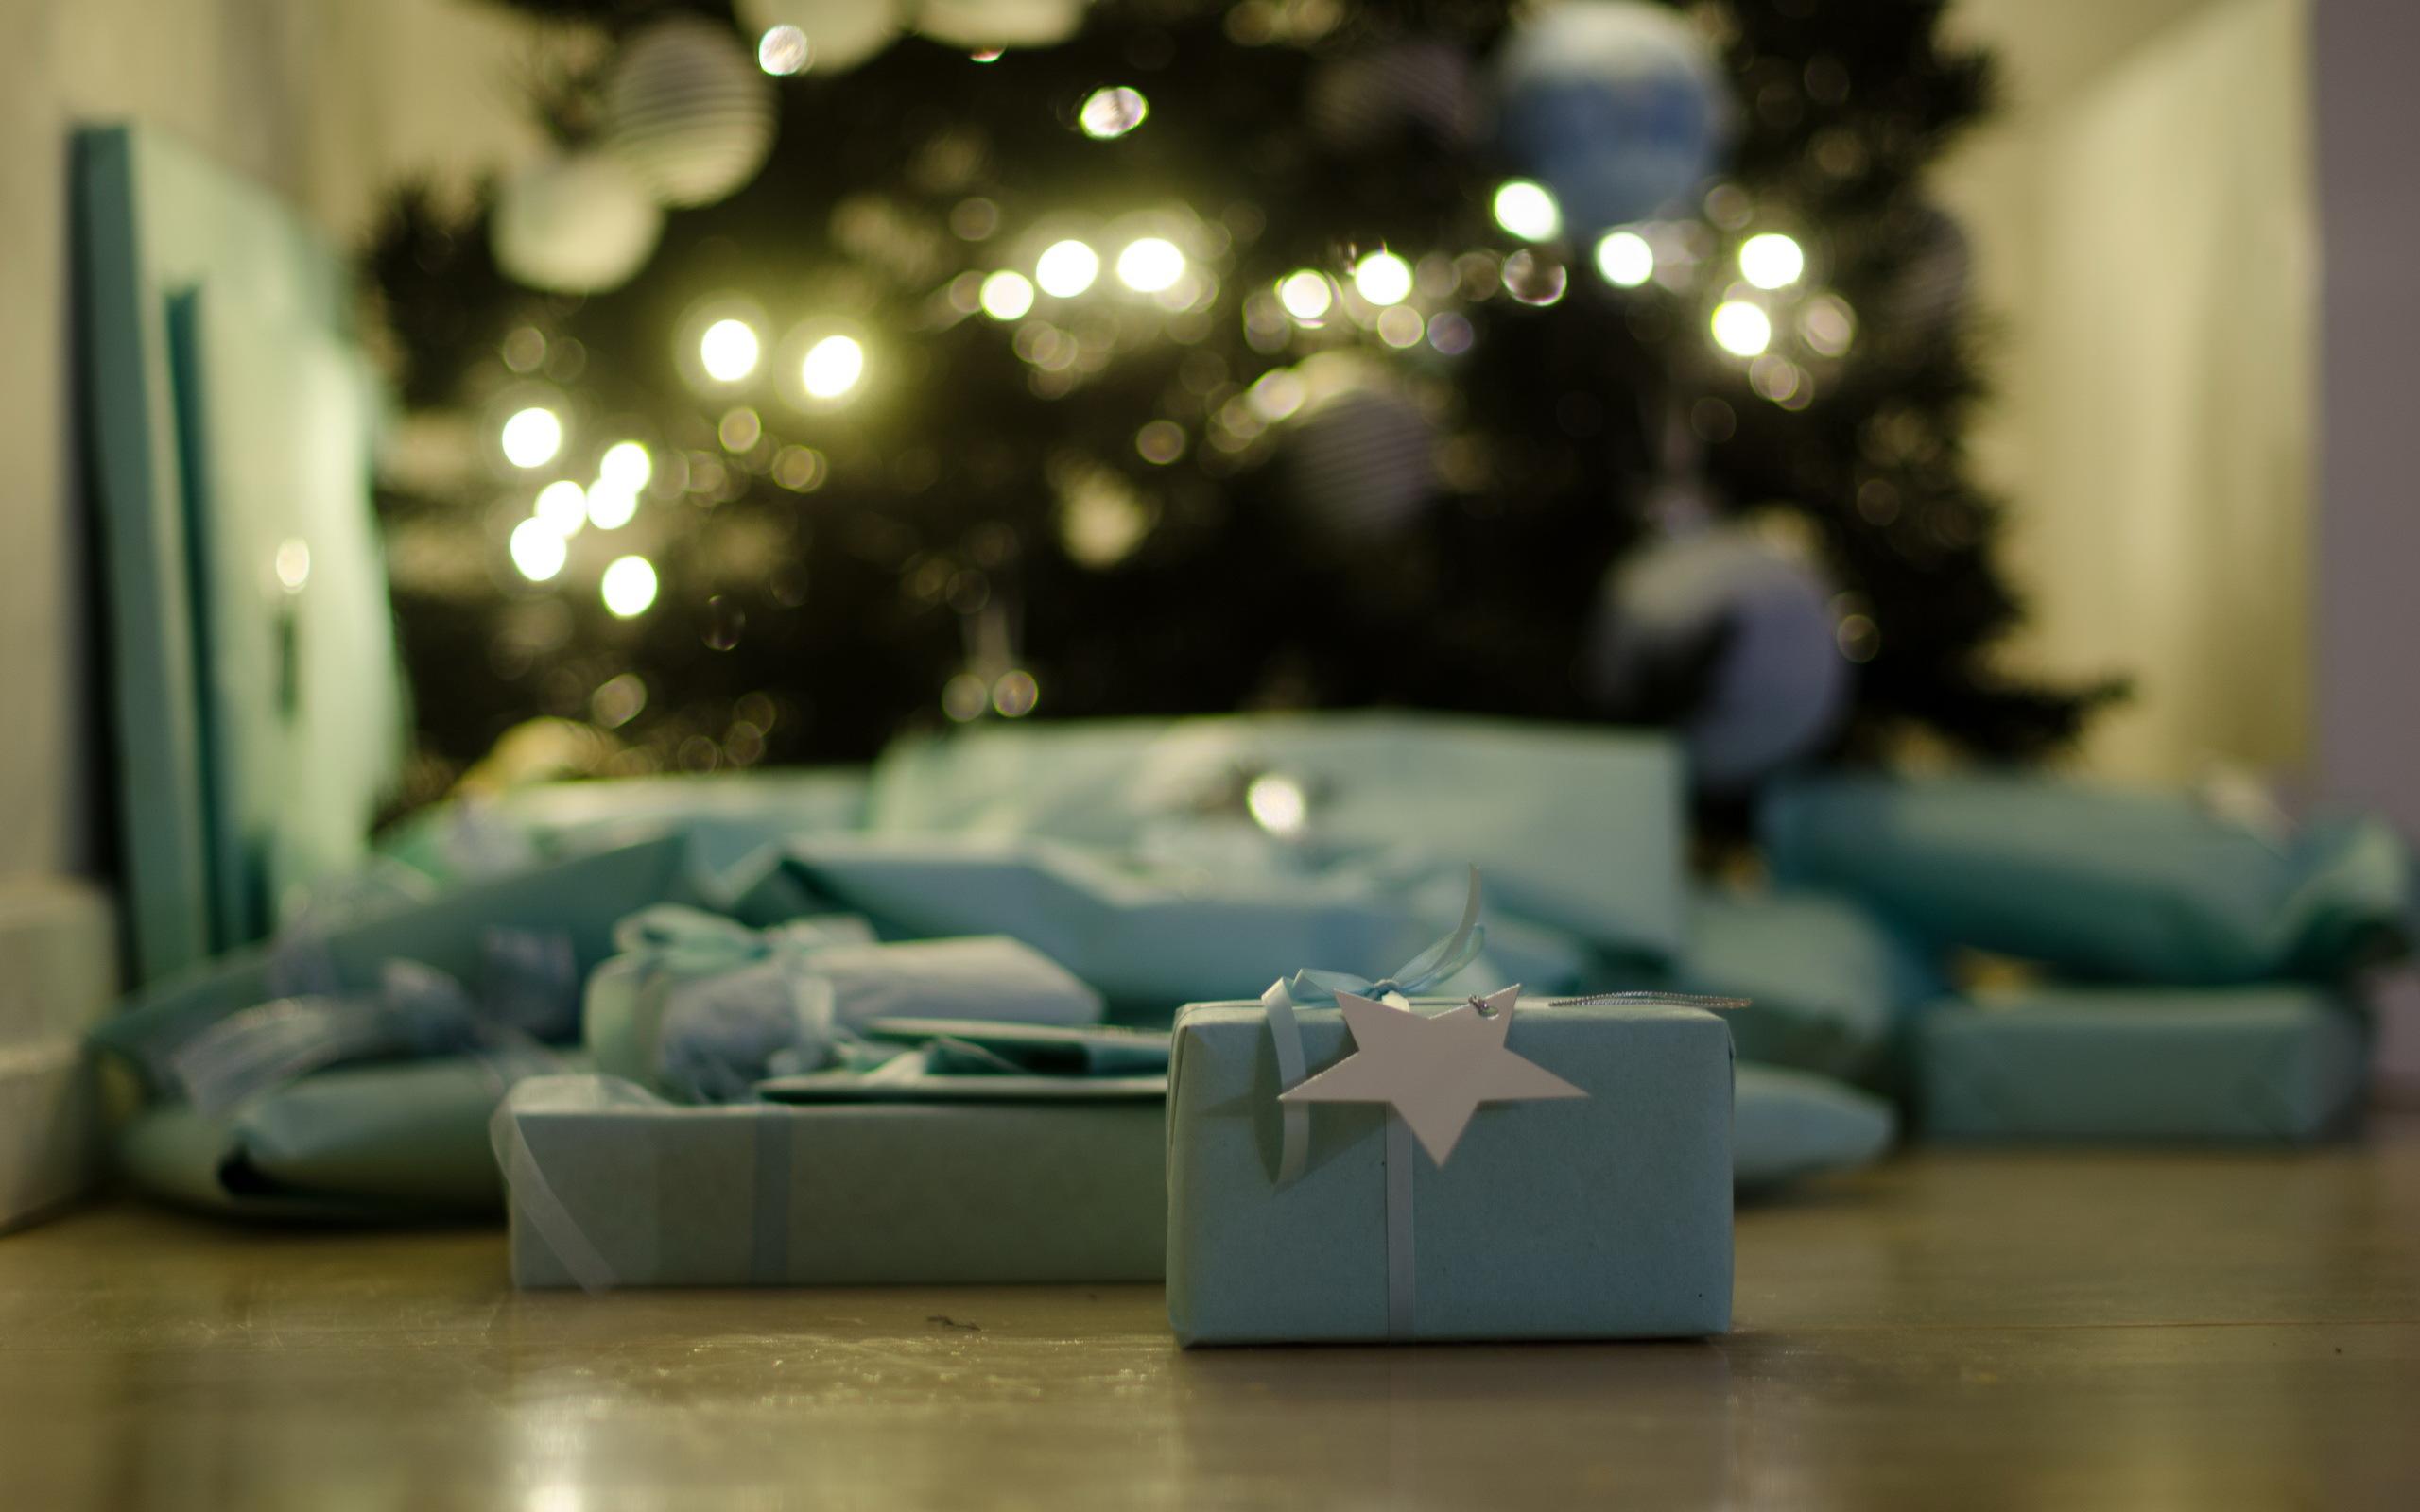 free wallpaper christmas present - photo #28